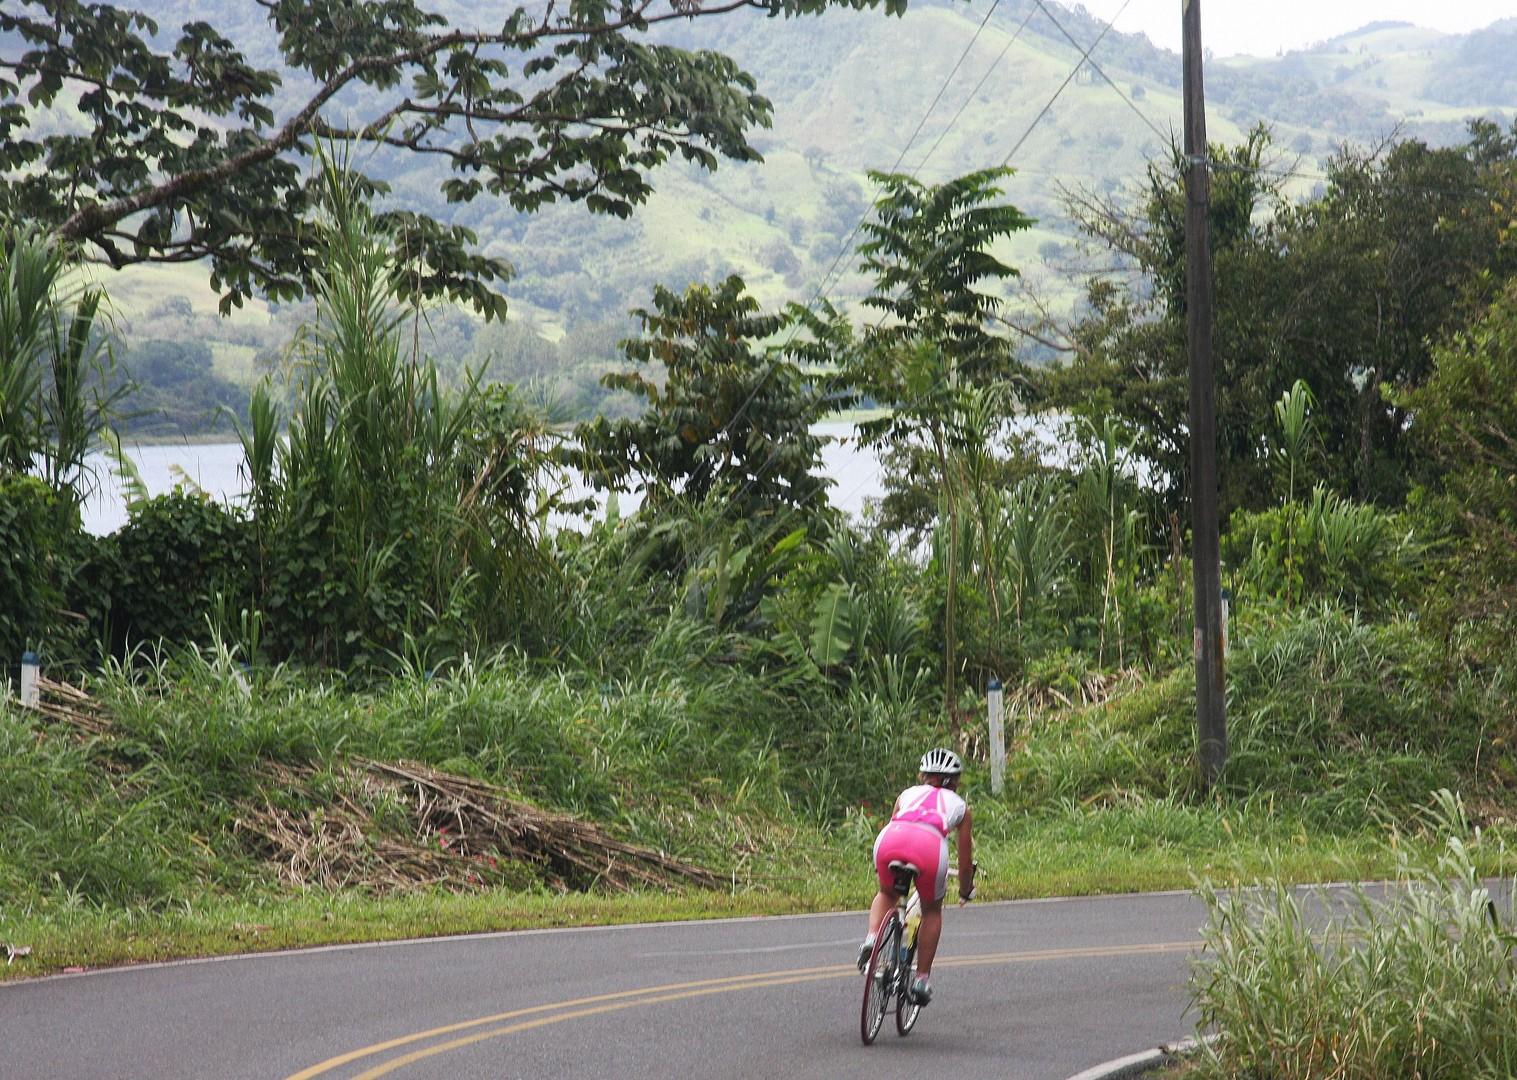 ruta-de-los-volcanes-costa-rica-guided-road-cycling-holiday-san-jose.jpg - Costa Rica - Ruta de los Volcanes - Road Cycling